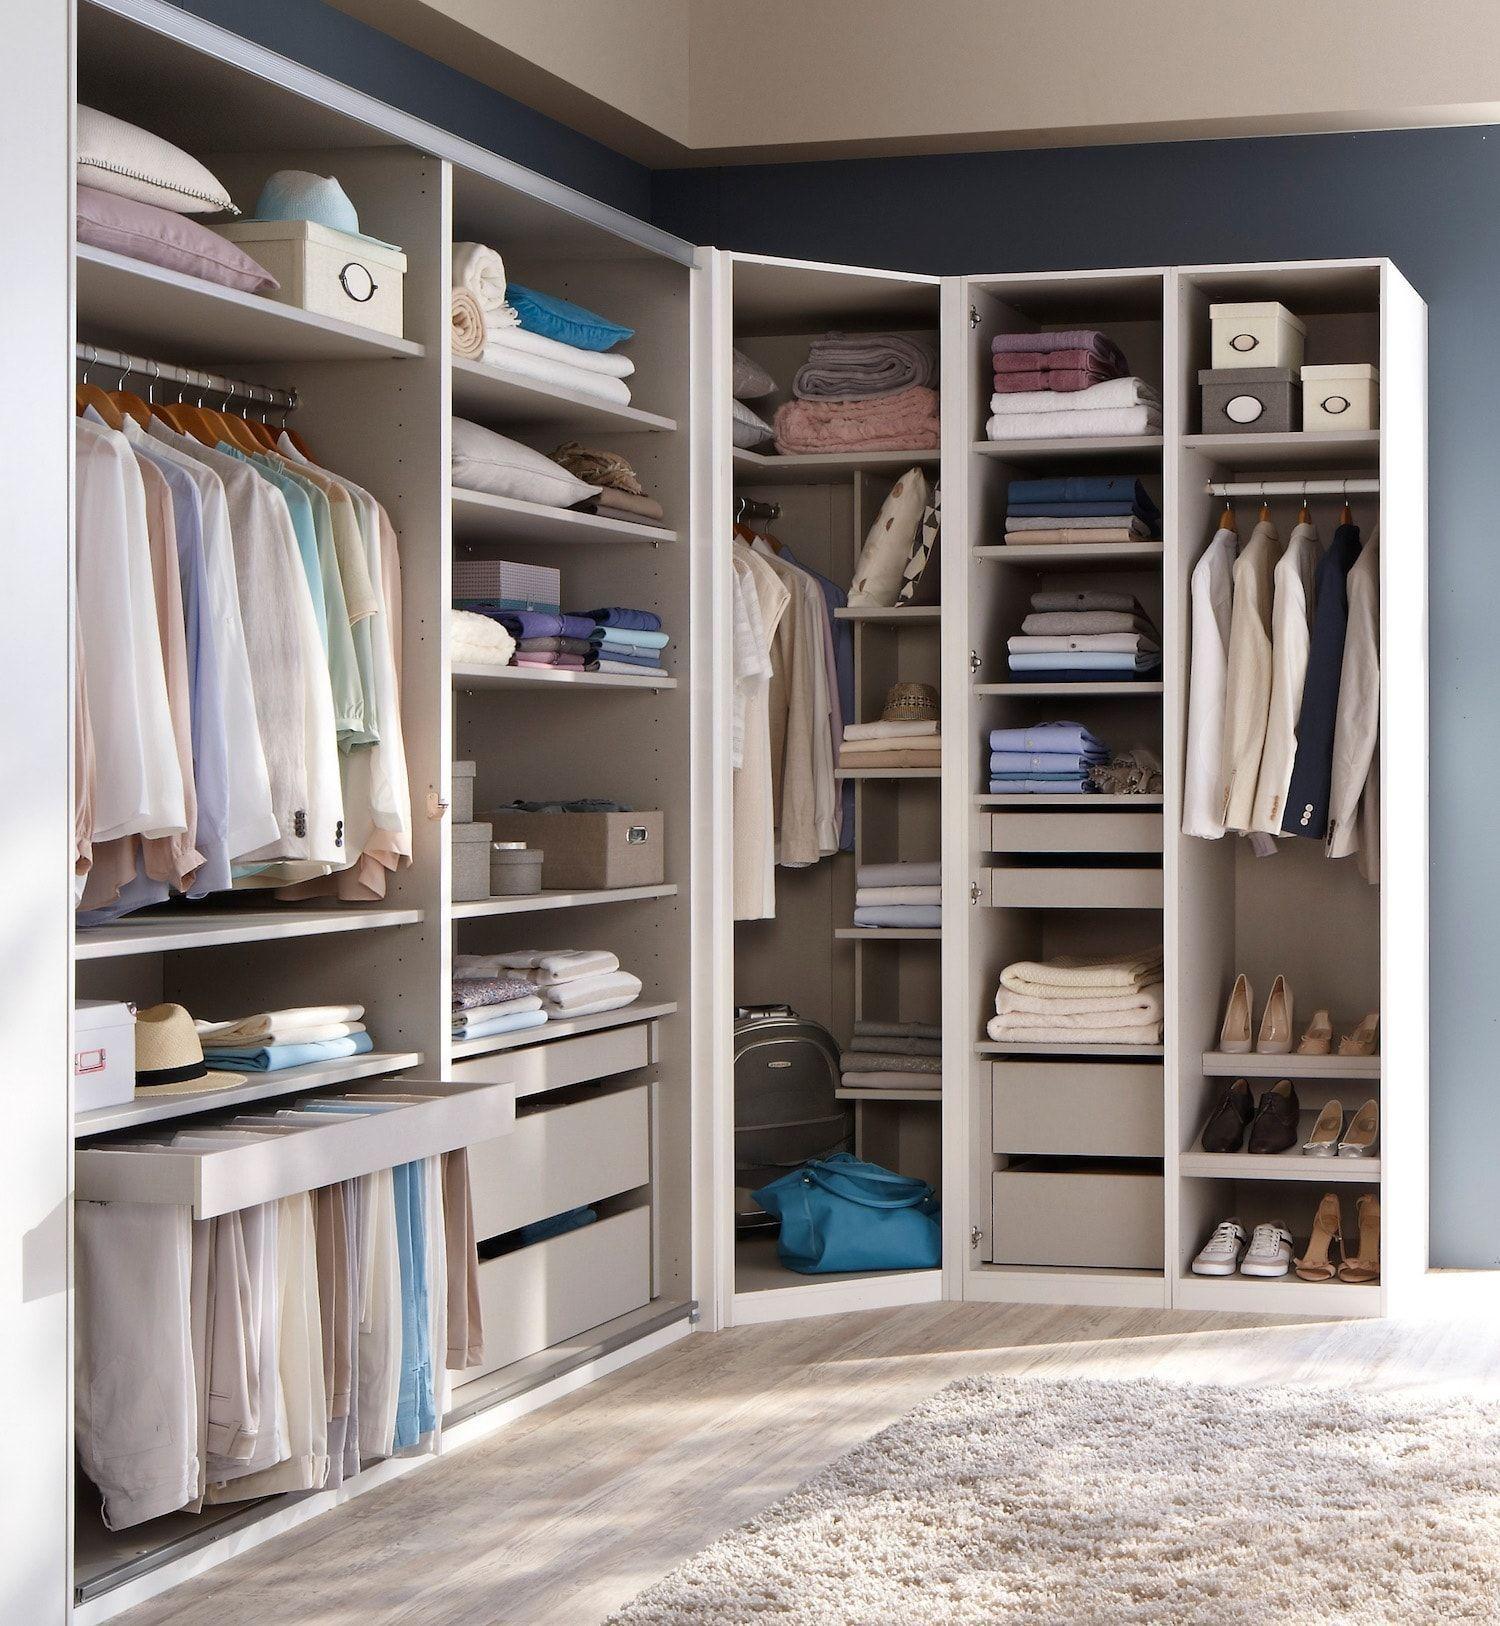 Conforama Eckgarderobe In 2020 Dressing Room Mirror Bedroom Closet Design Closet Layout